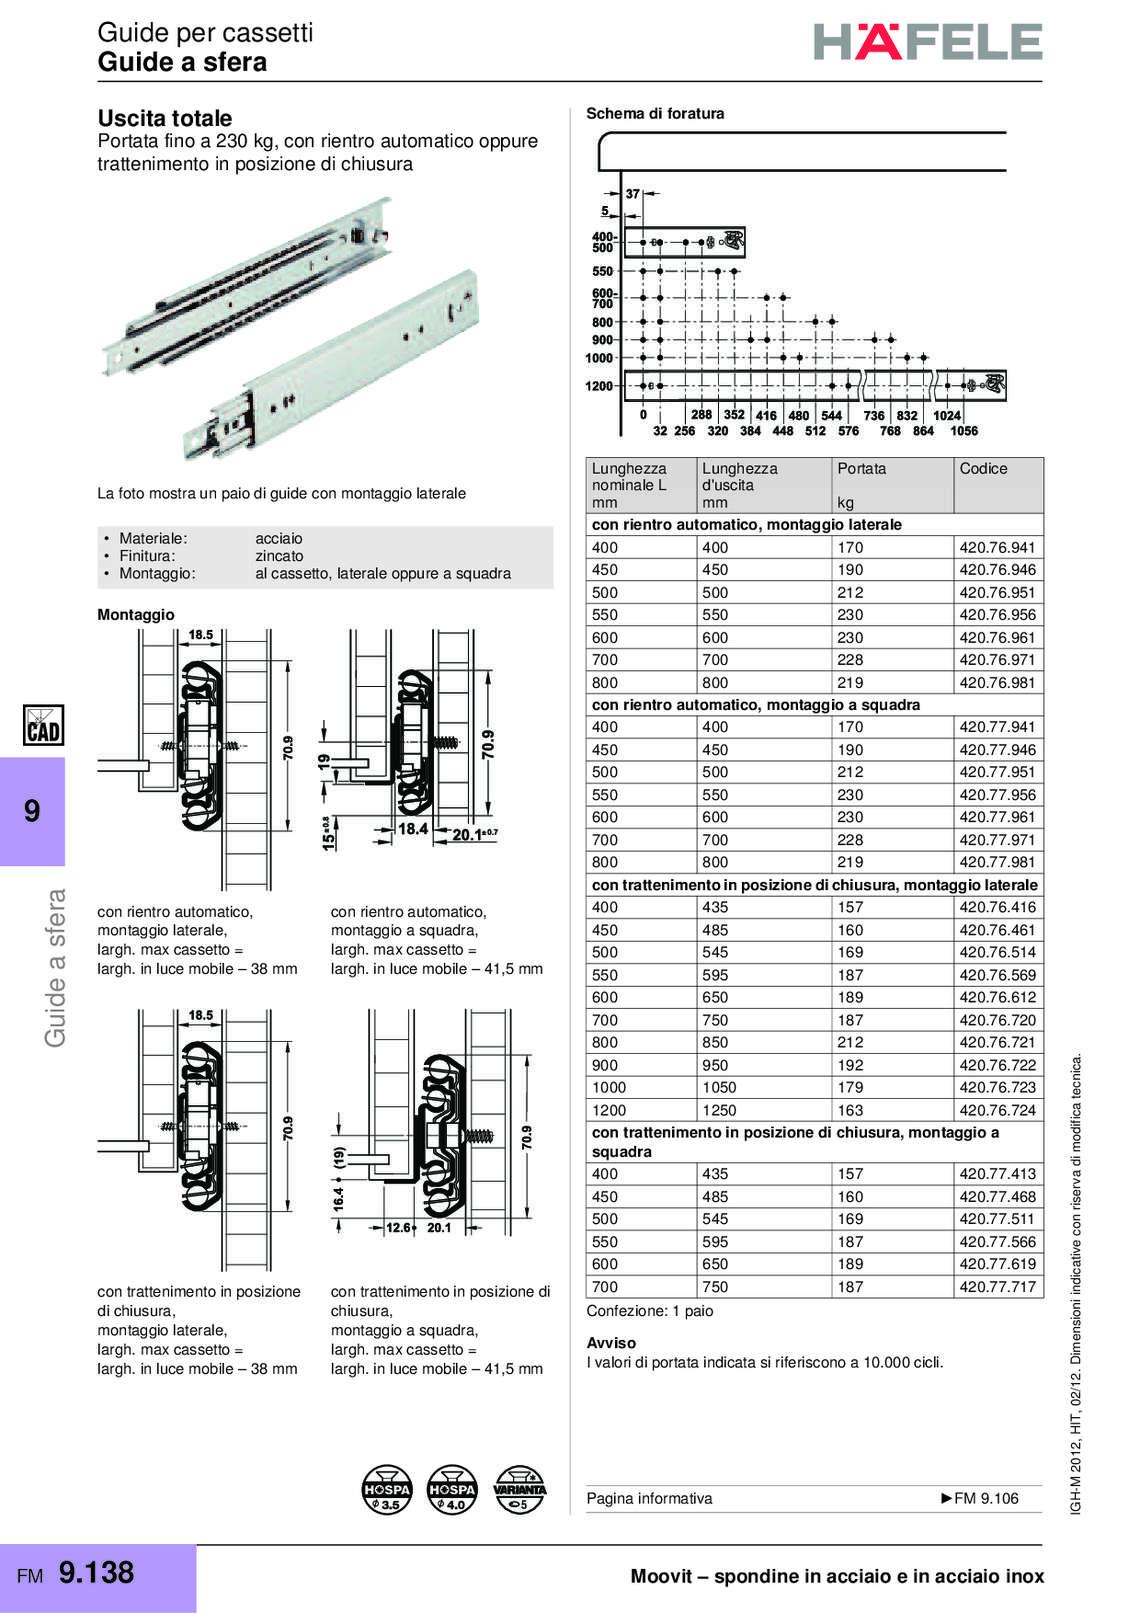 hafele-spondine-e-guide-per-mobili_40_195.jpg